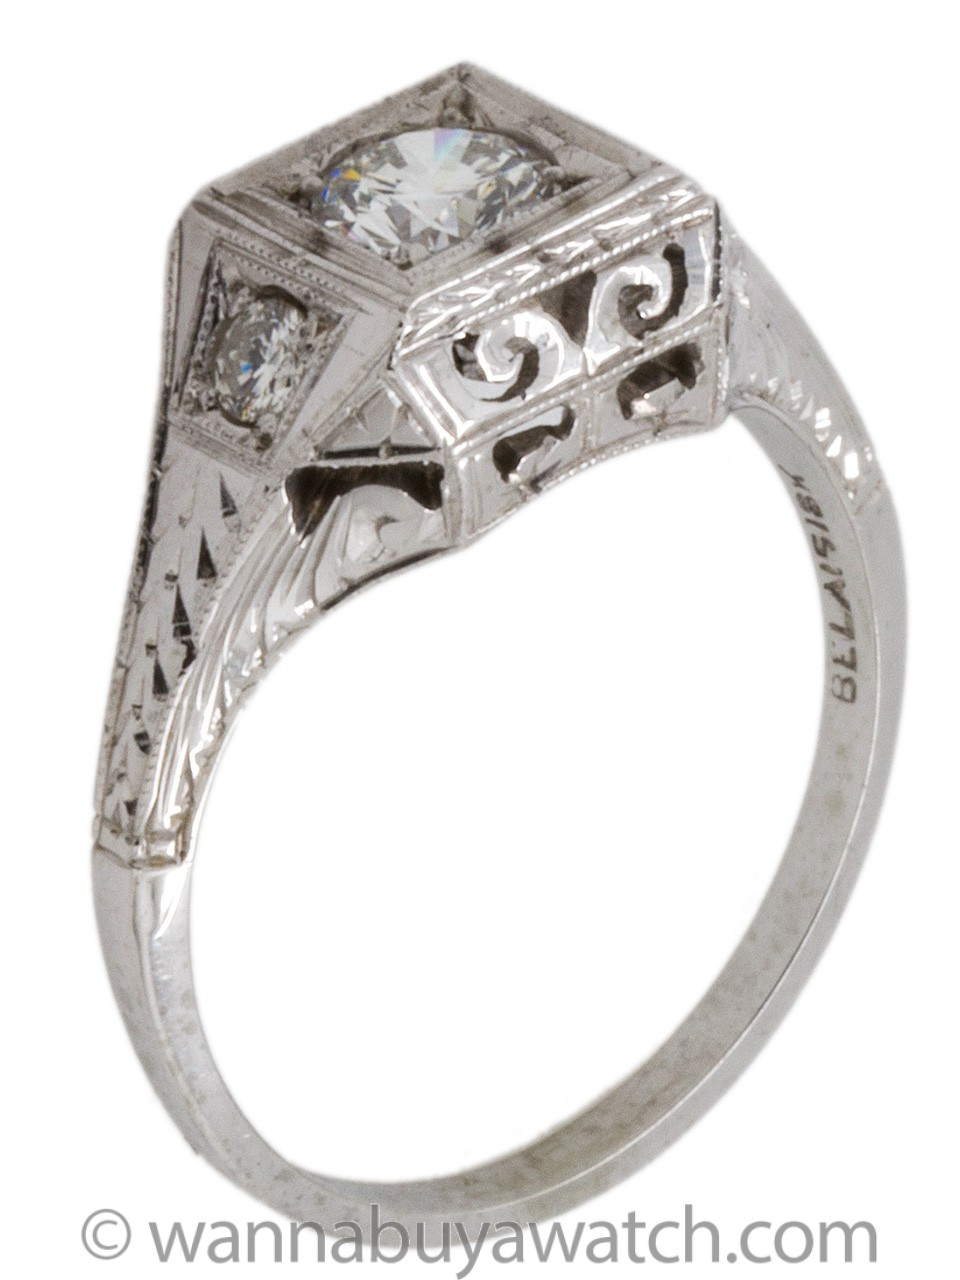 Vintage Belais Engagement Ring 18K White Gold 0.37ct H-VS2 circa 1930s